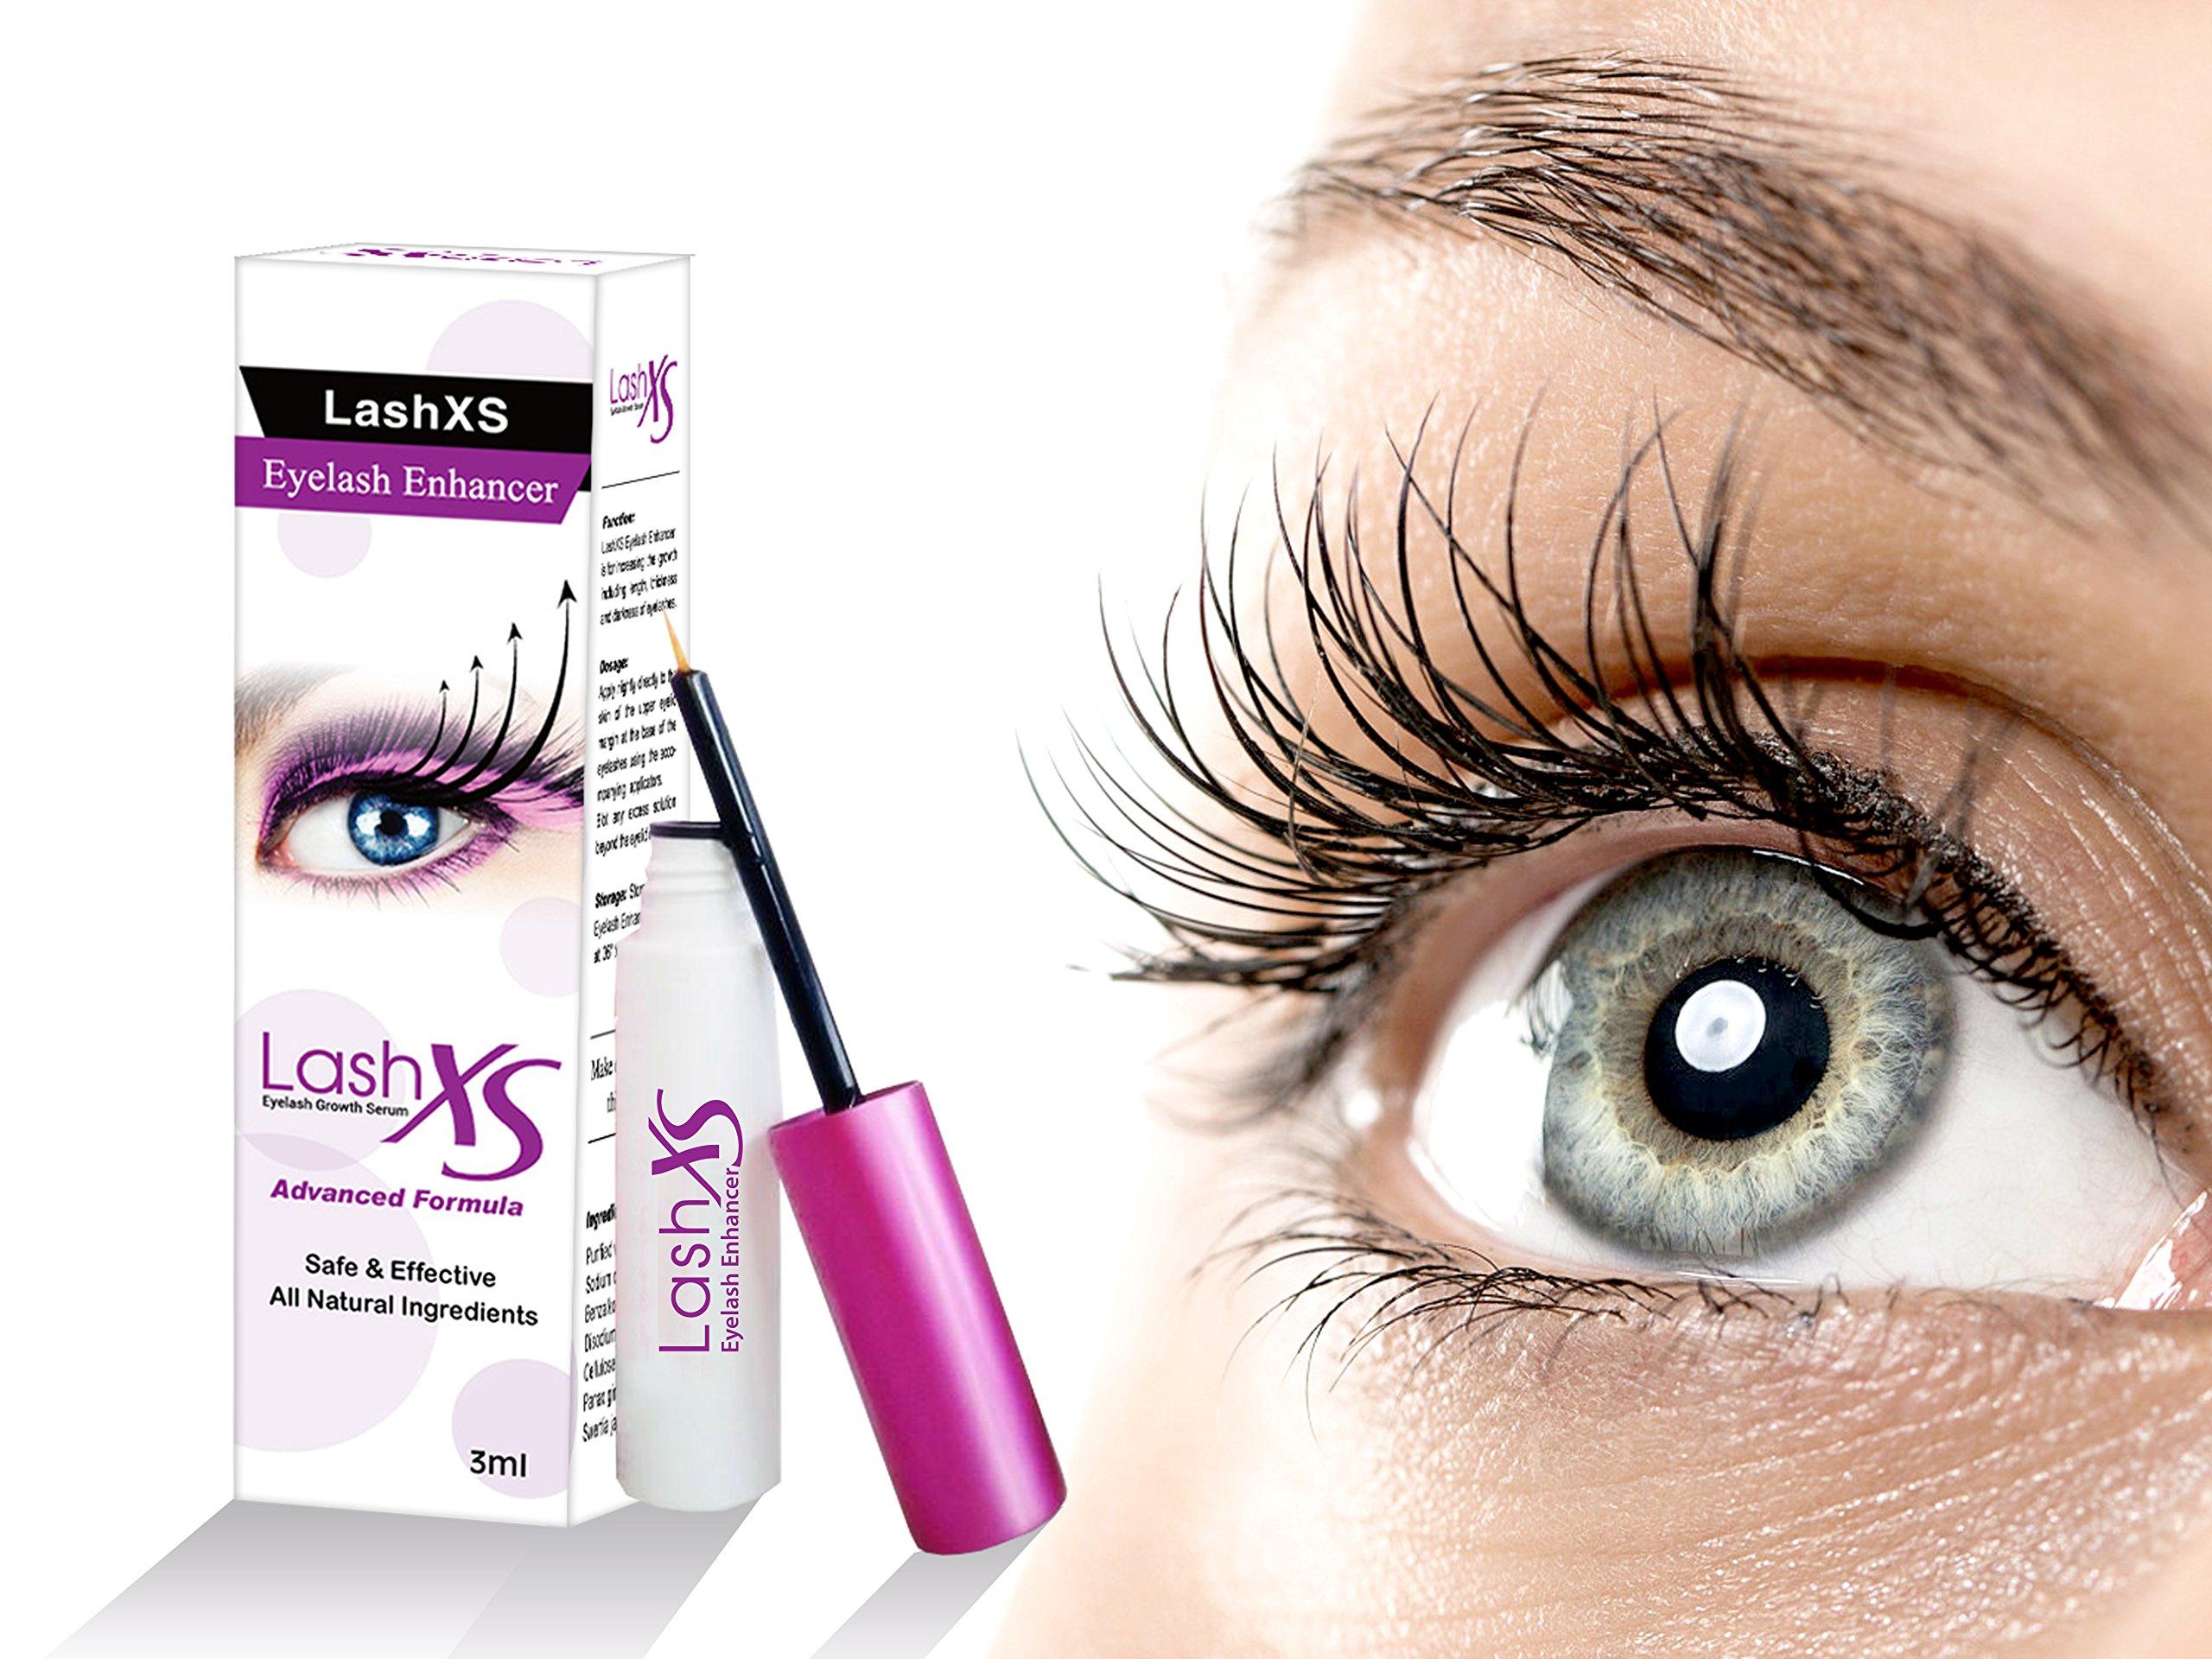 b0614e93152 LashXS Eyelash Serum 3ml | All Natural Advanced Treatment With Powerful  Extracts | Eyelash Enhancing Serum